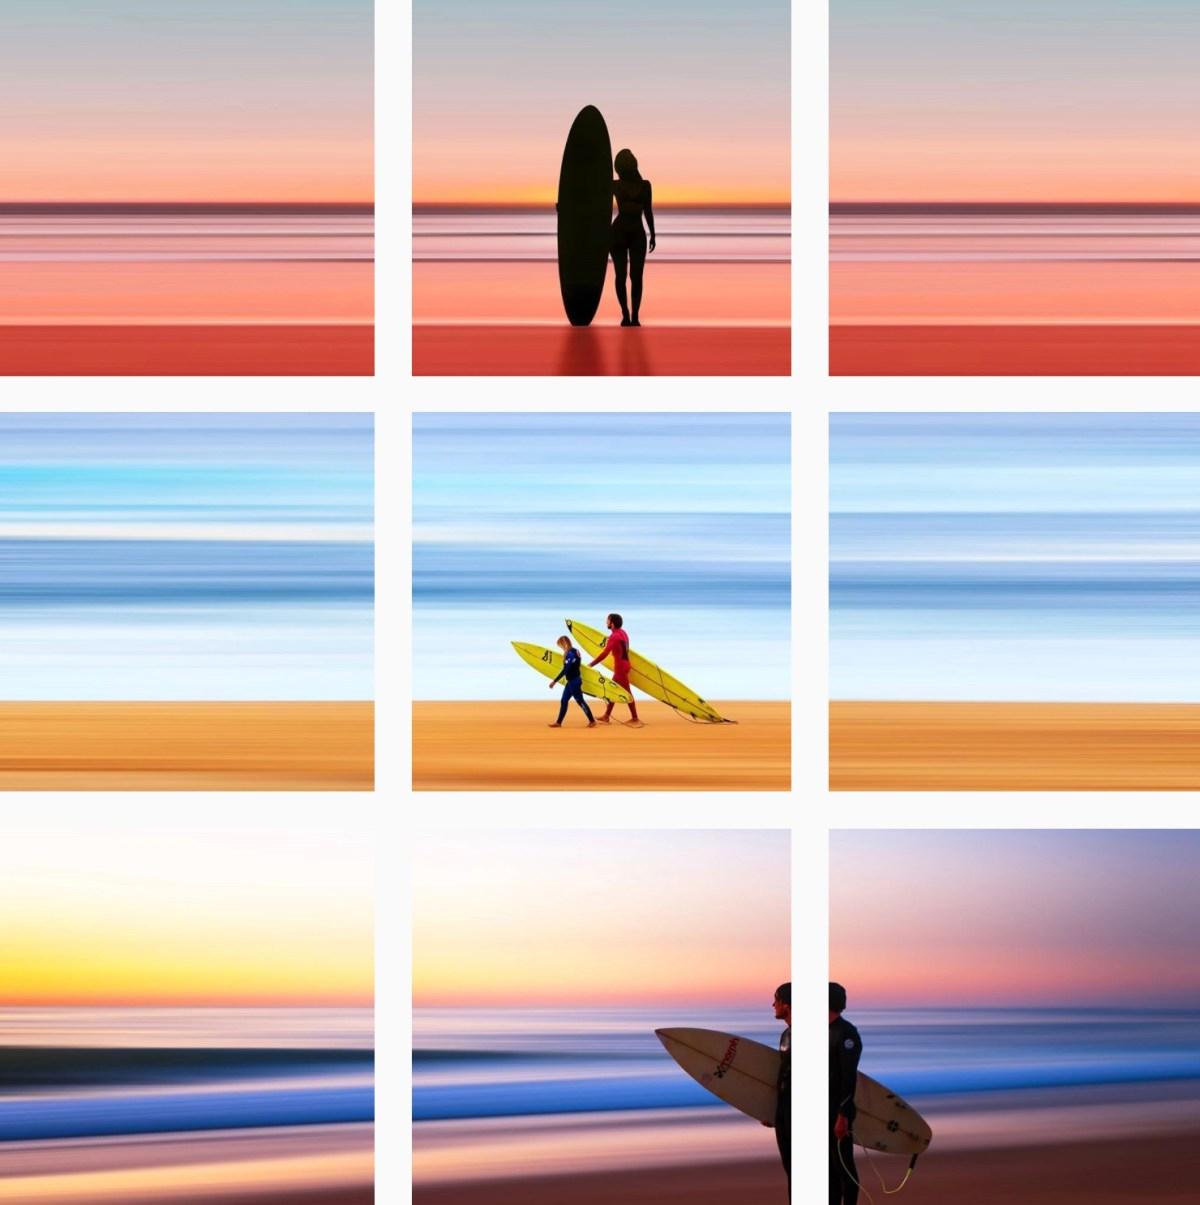 colorful-surf-photography-by-thomas-fotomas-trendland